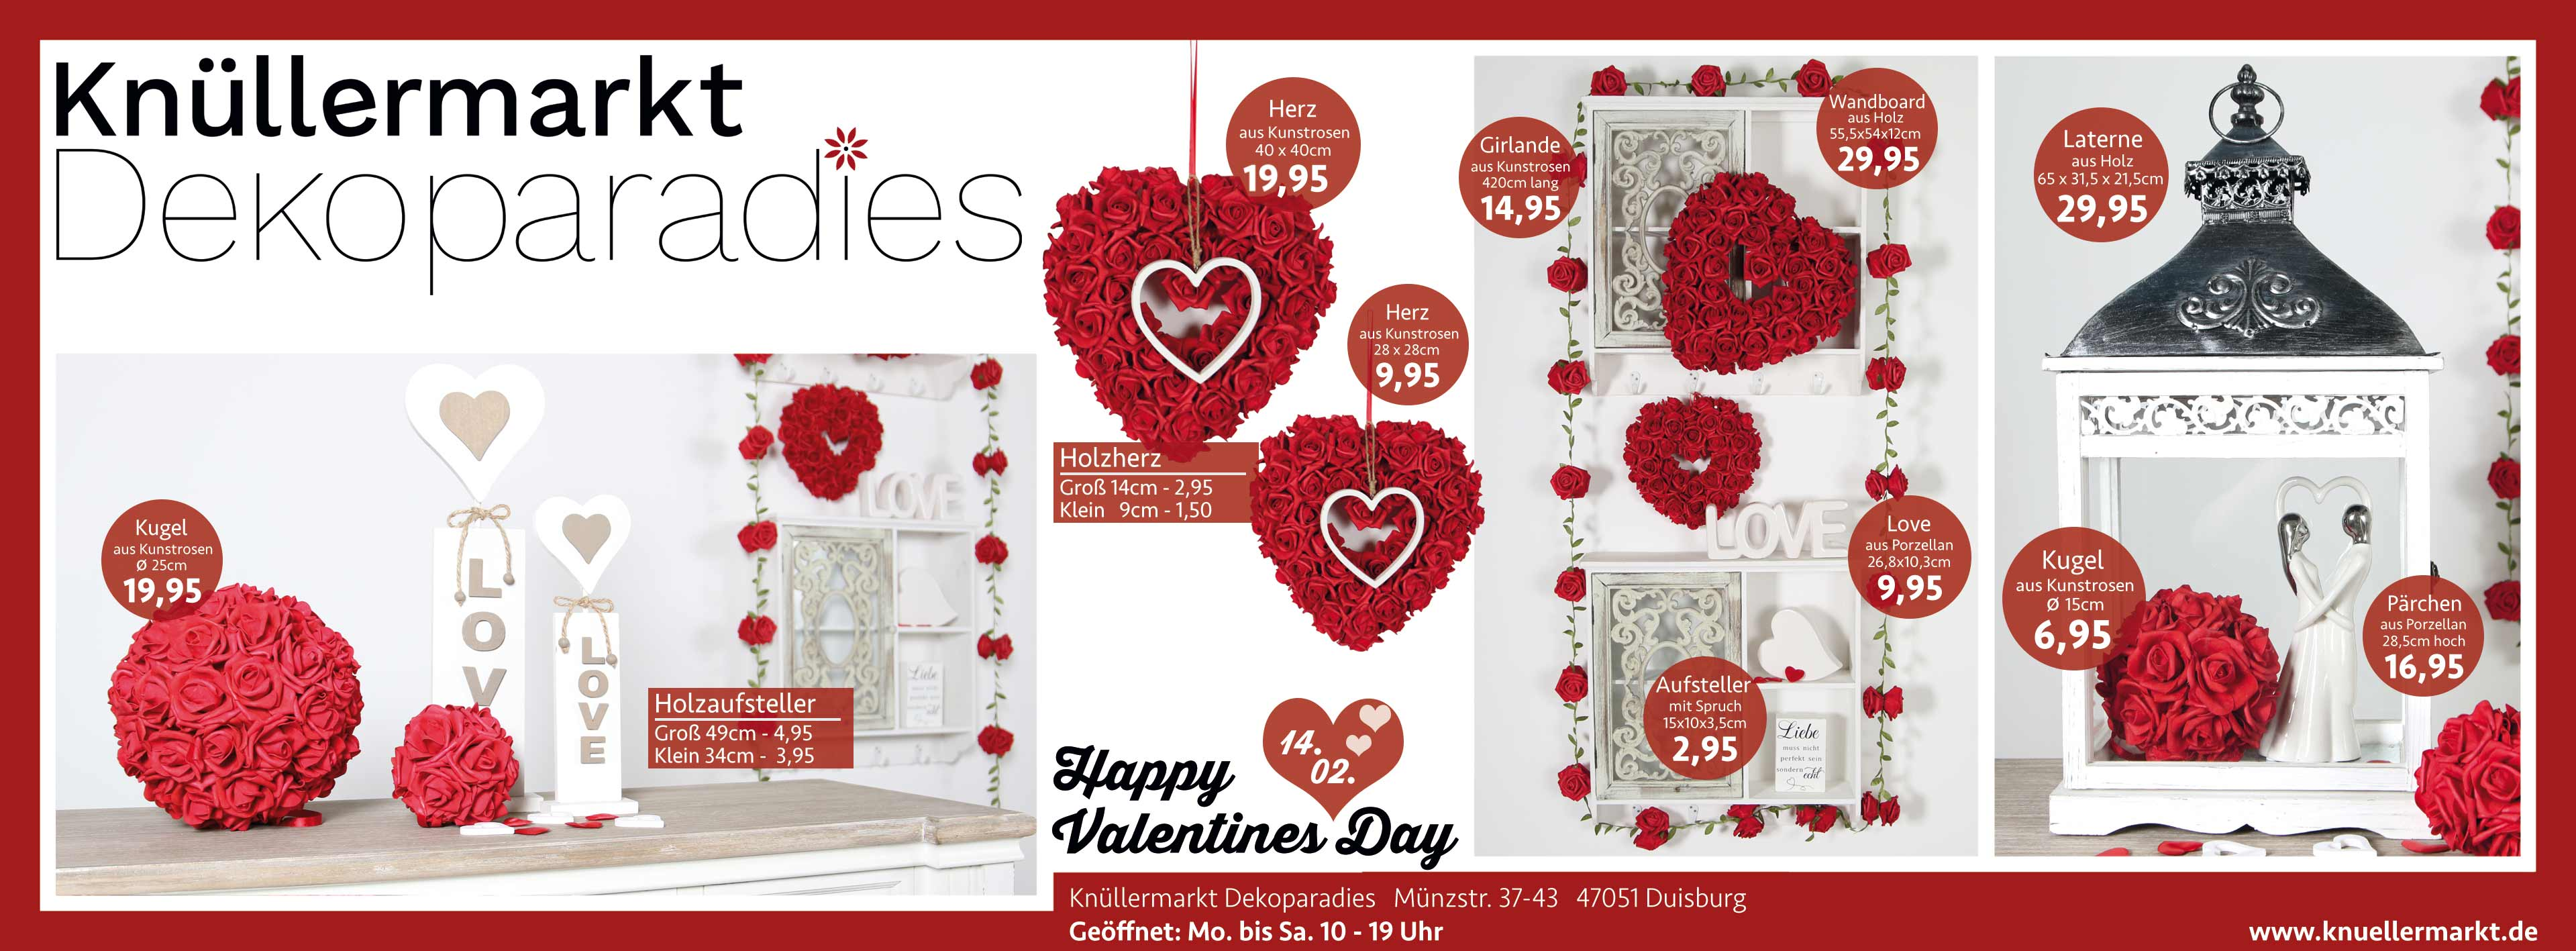 am 14 februar ist valentinstag kn llermarkt dekoparadies. Black Bedroom Furniture Sets. Home Design Ideas